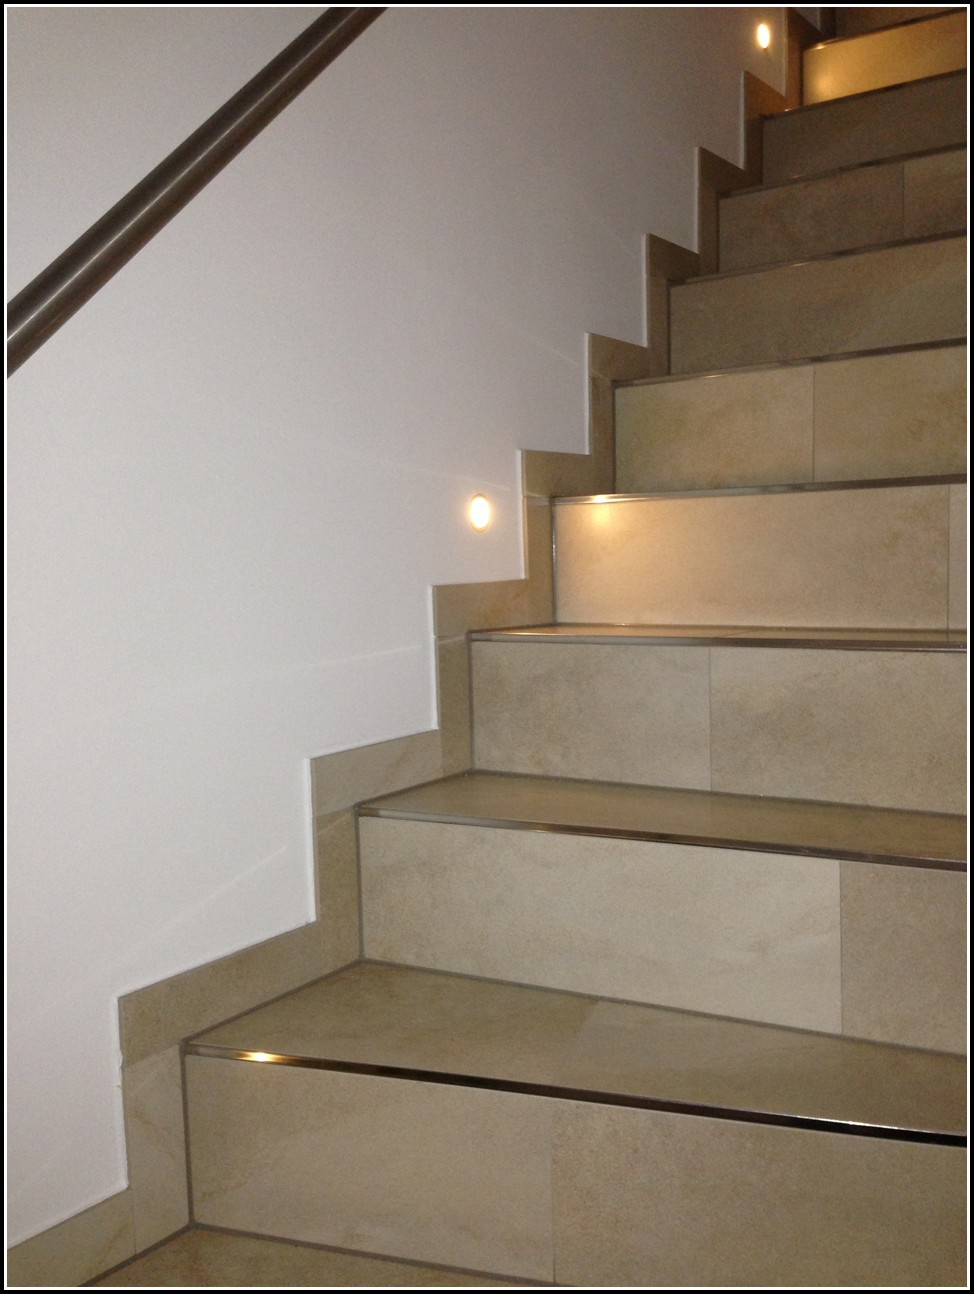 Treppen Fliesen Verlegen Anleitung